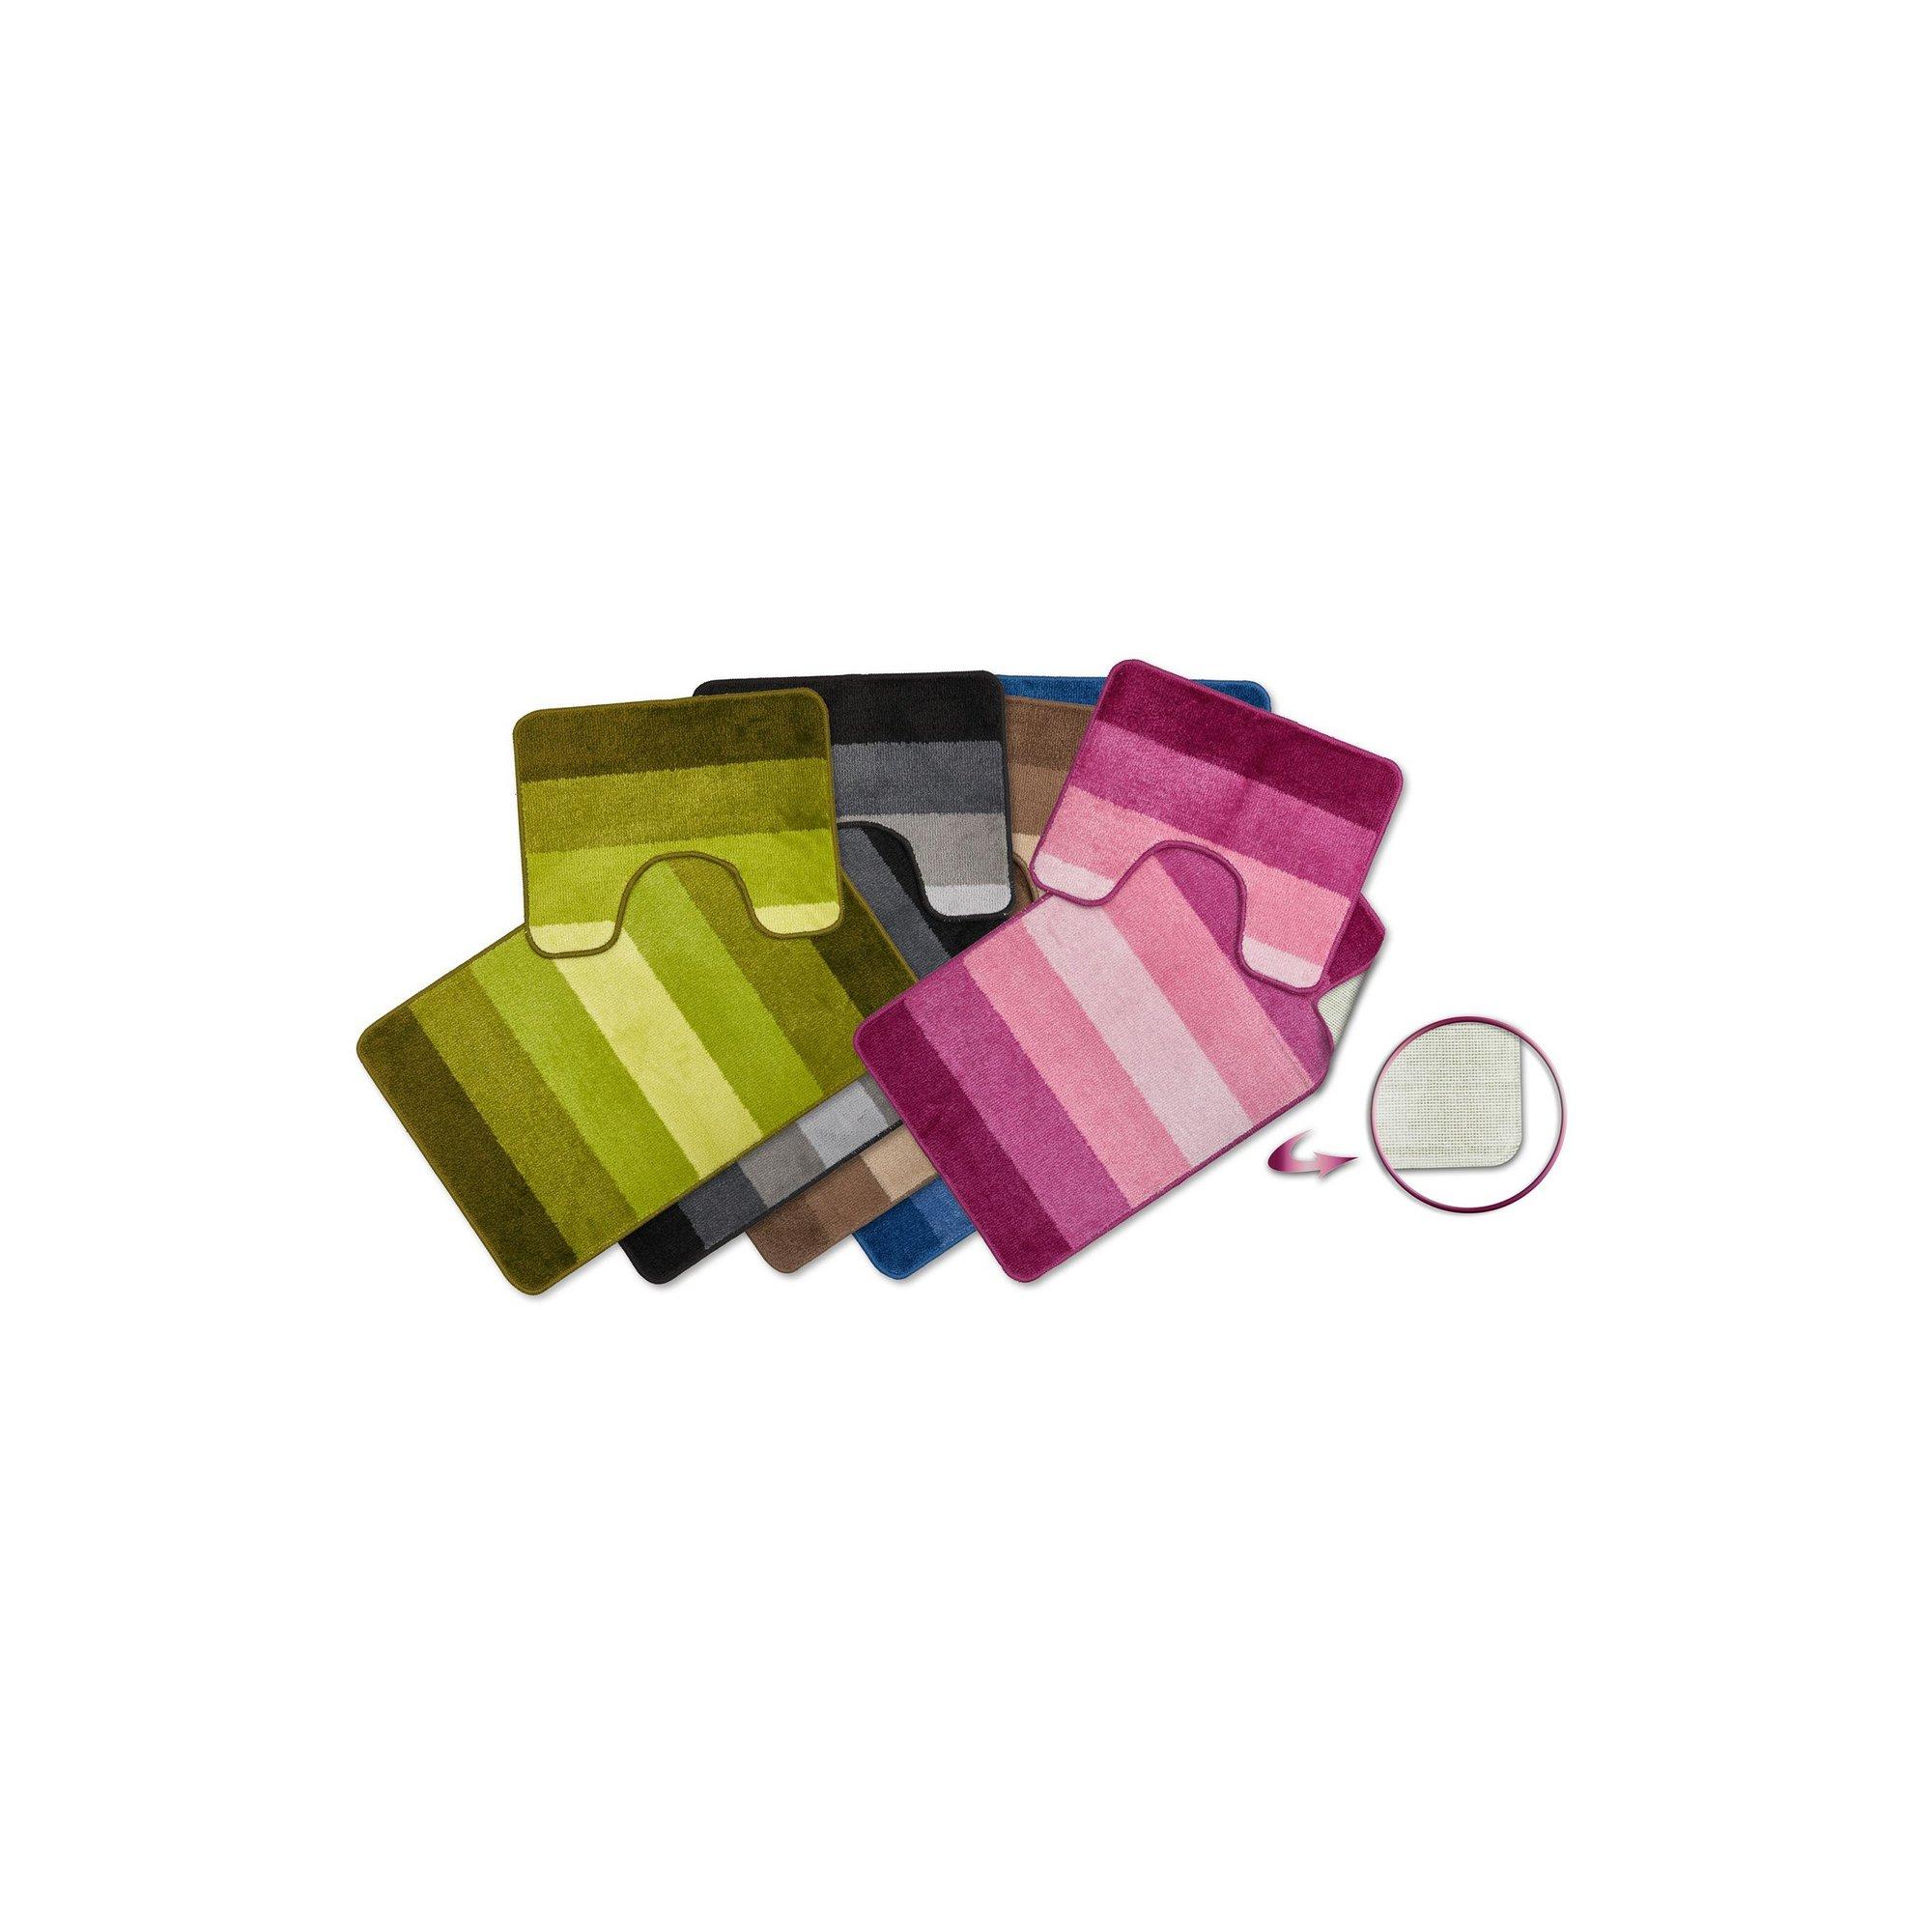 Image of Jersey Tonal Stripe 2 Piece Bath Set